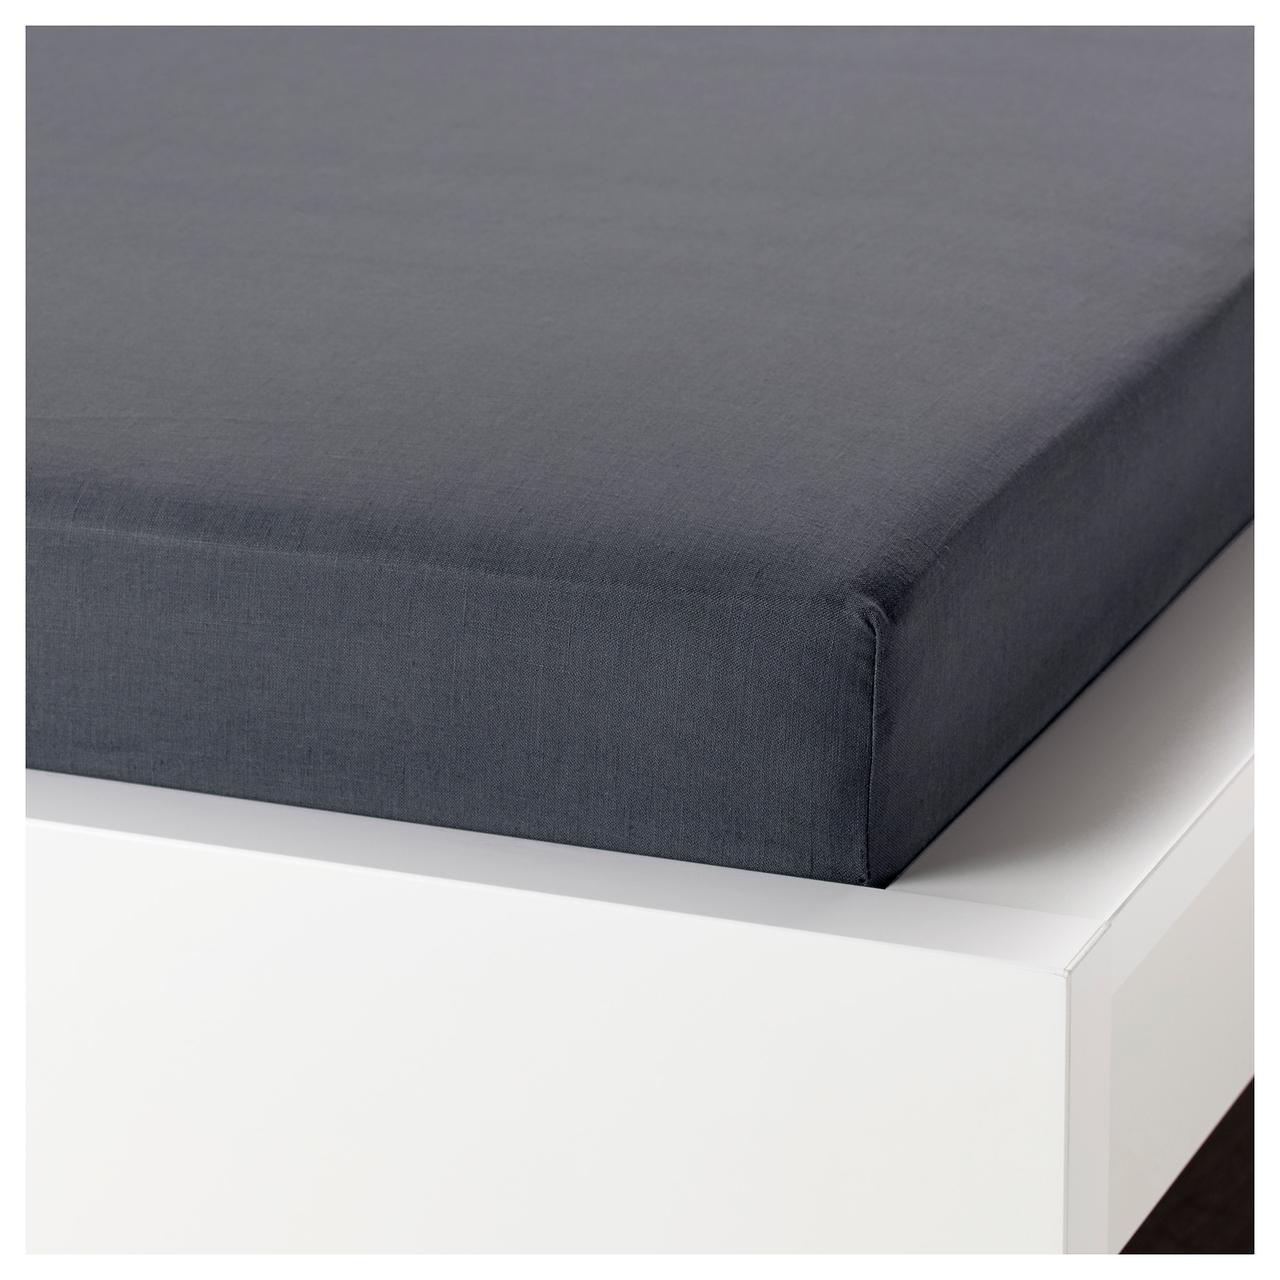 Простыня на резинке IKEA PUDERVIVA 160х200 см темно-серая 704.120.74